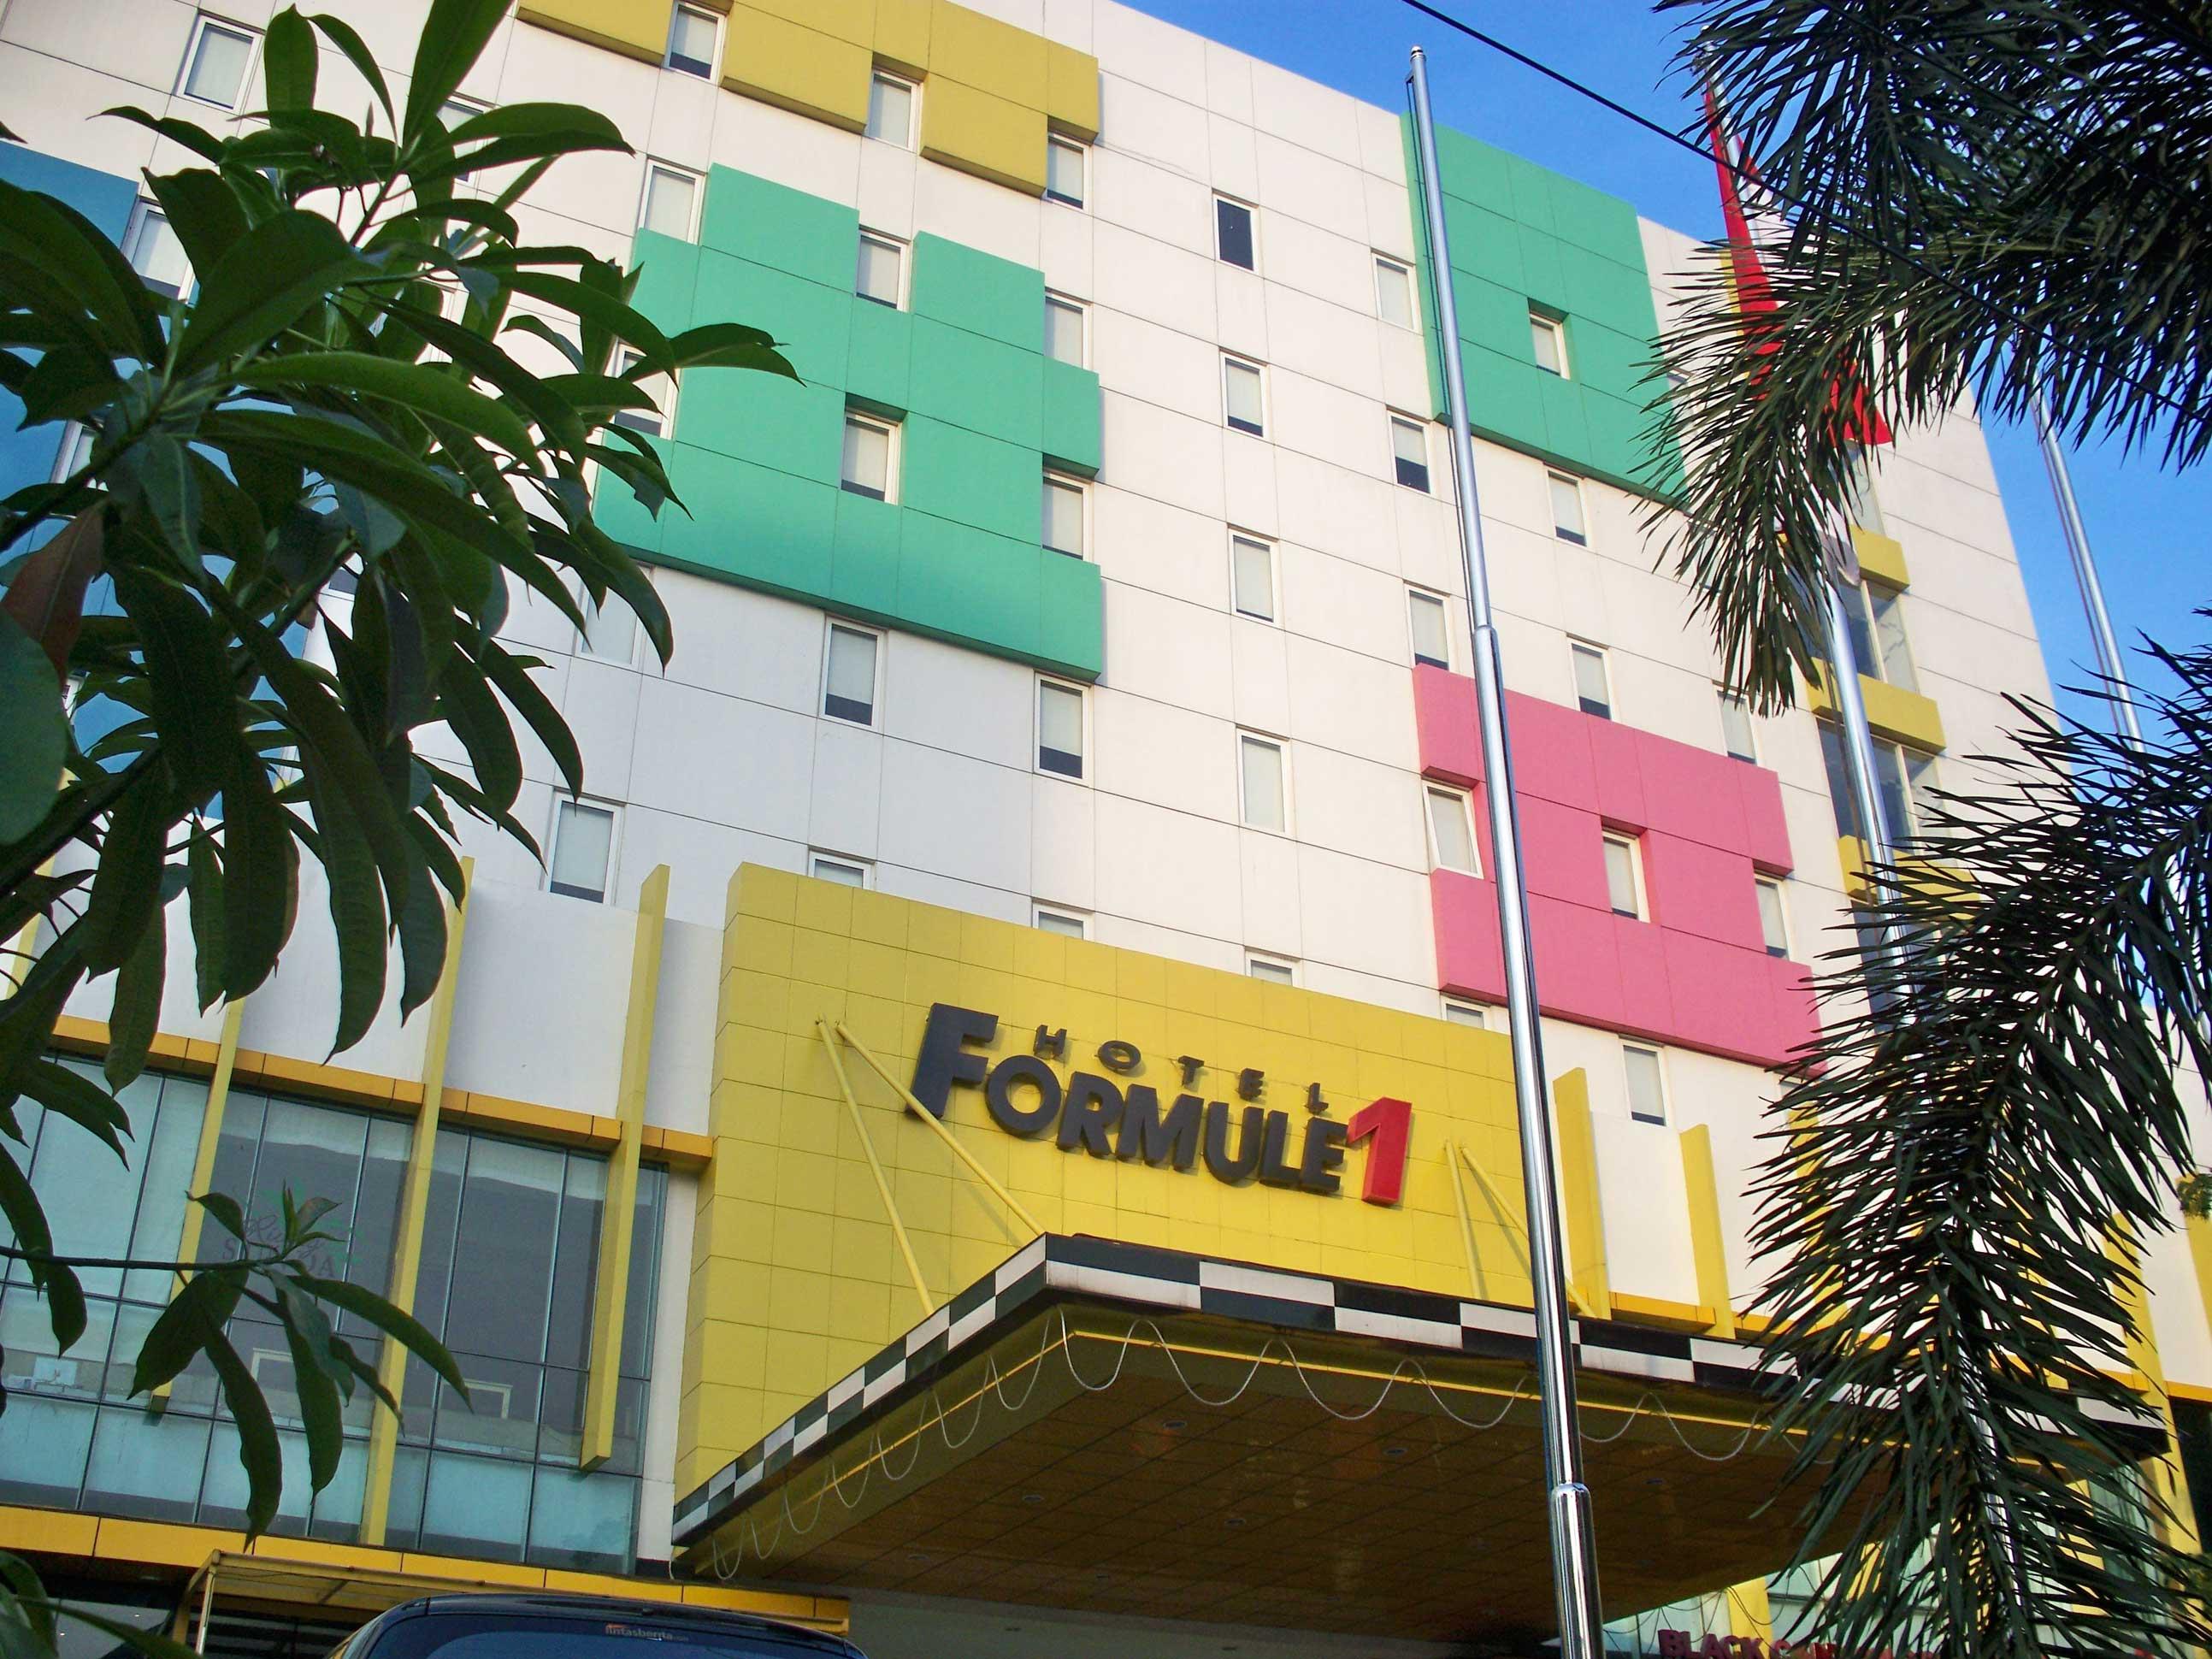 Hotel_Formule_1_-_panoramio.jpg